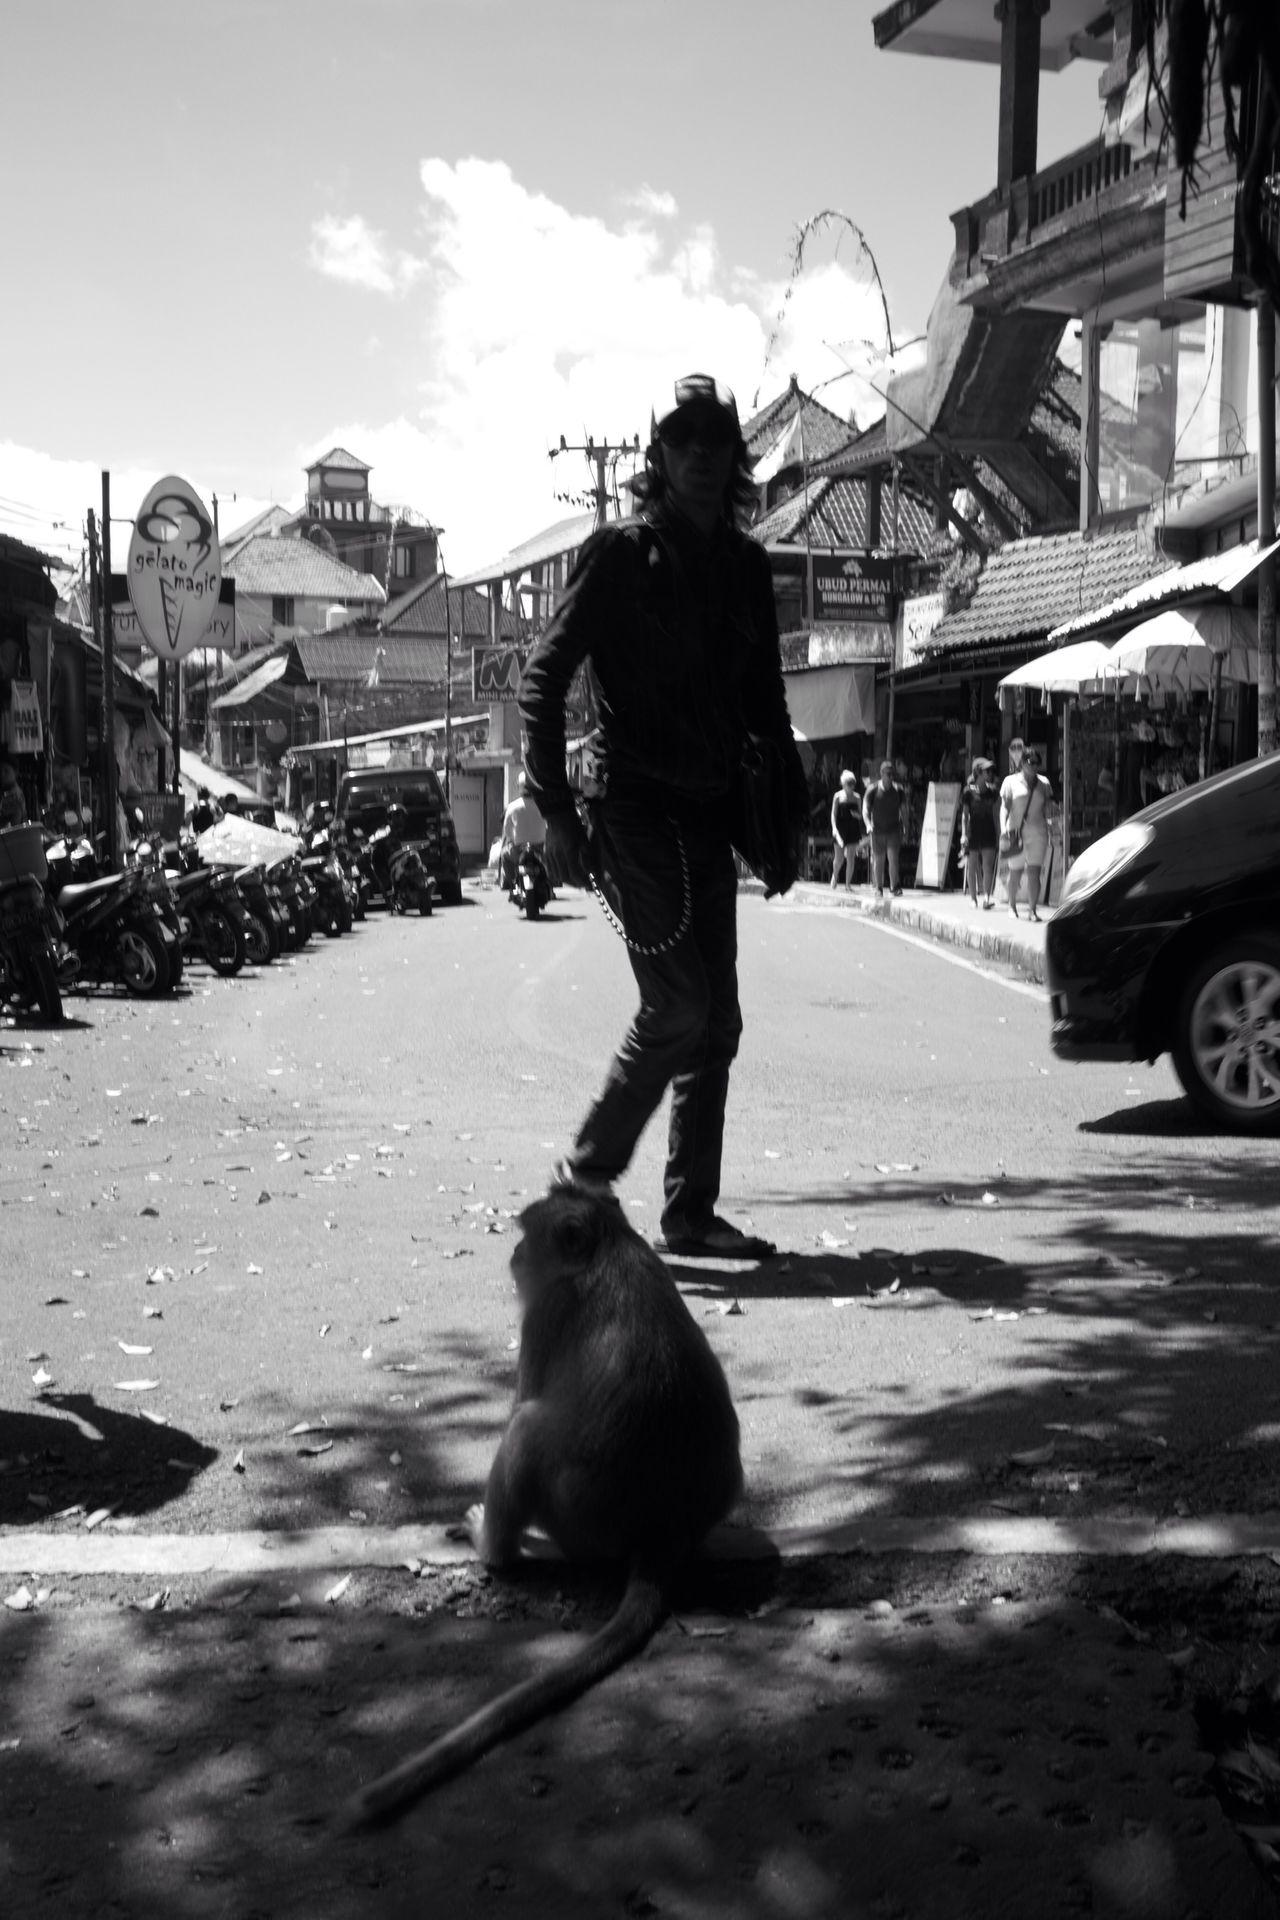 The Street Photographer - 2017 EyeEm Awards Streetphotography Street Photography B&w Street Photography Ubud Ubud, Bali Bali Bali, Indonesia INDONESIA Monkey Forest Candid Photography Fujifilm_xseries BYOPaper!